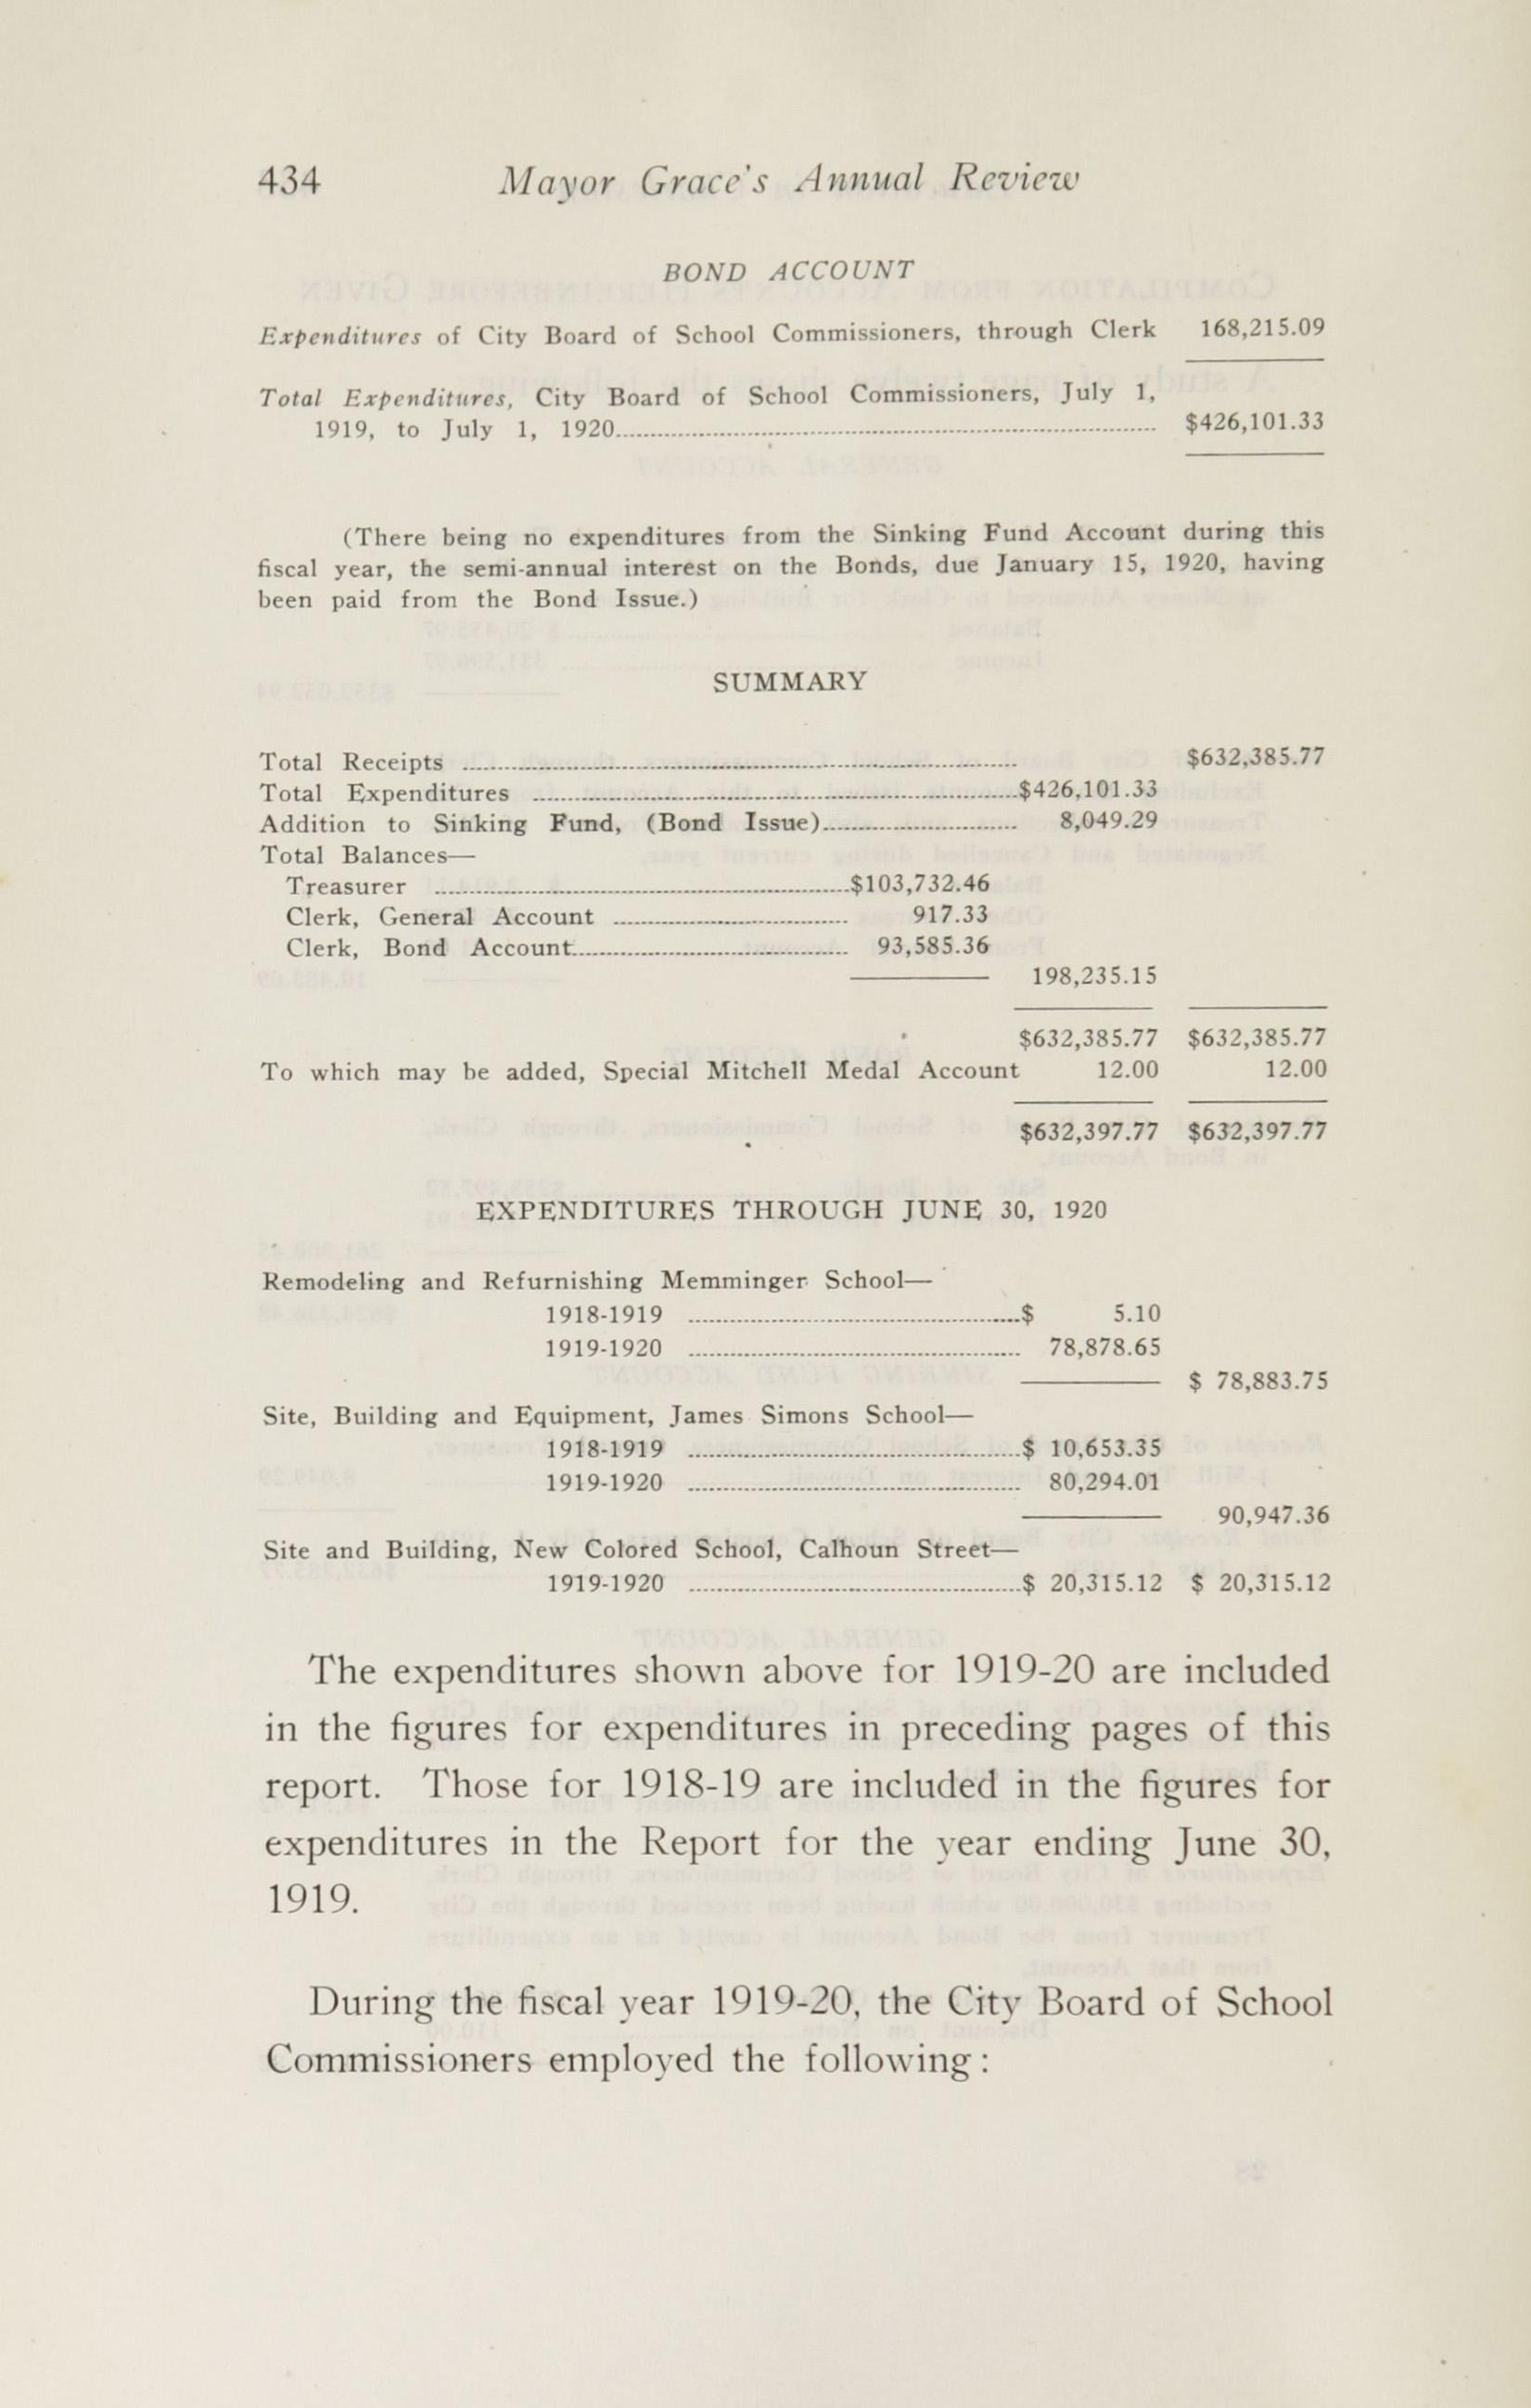 Charleston Yearbook, 1920, page 434